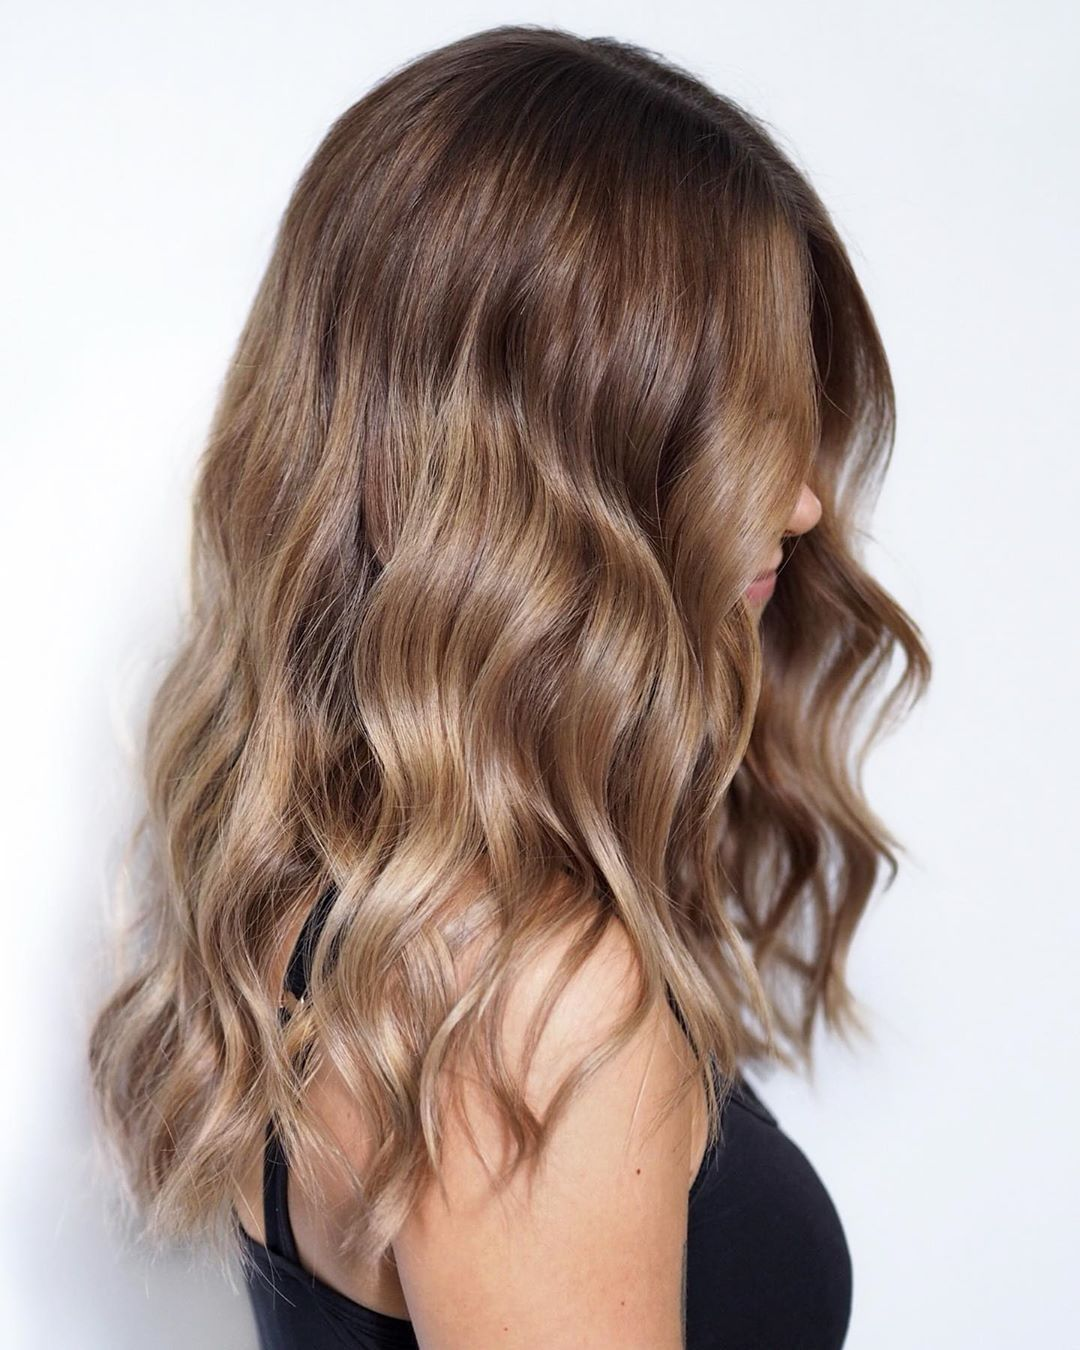 Caramel Hair Natural Waves Hair Color Auburn Hair Schwarzkopf Hair Color